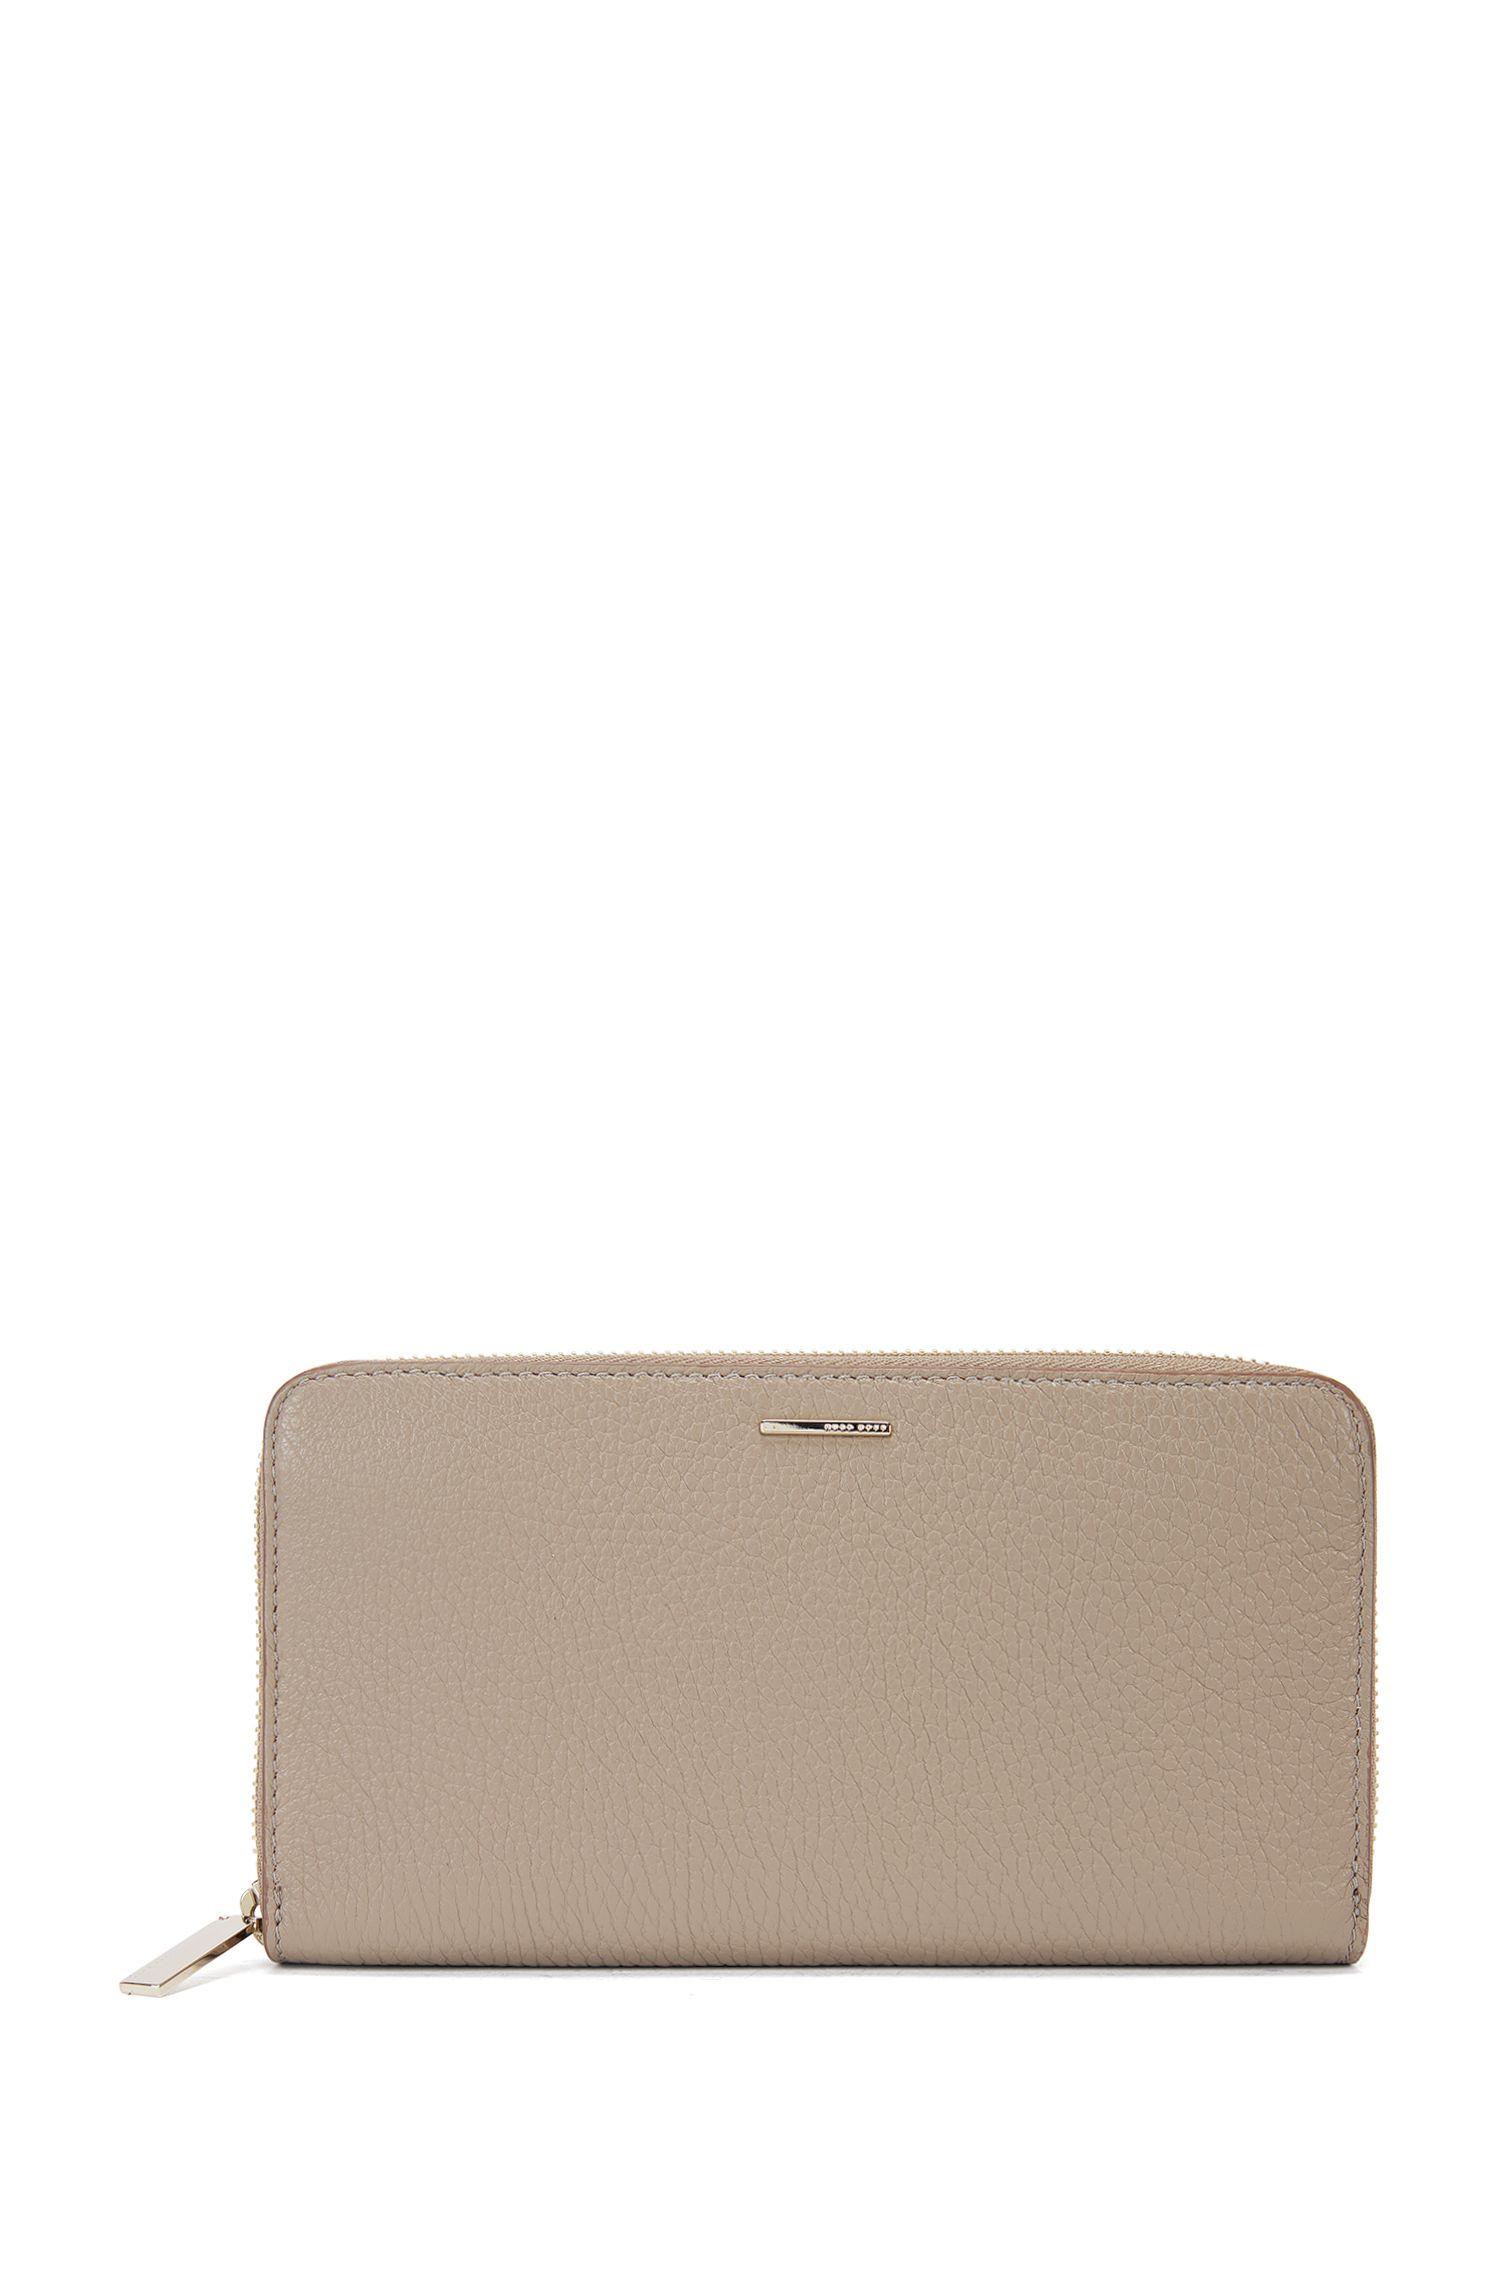 'Staple Ziparound A' | Leather Embossed Zip Wallet